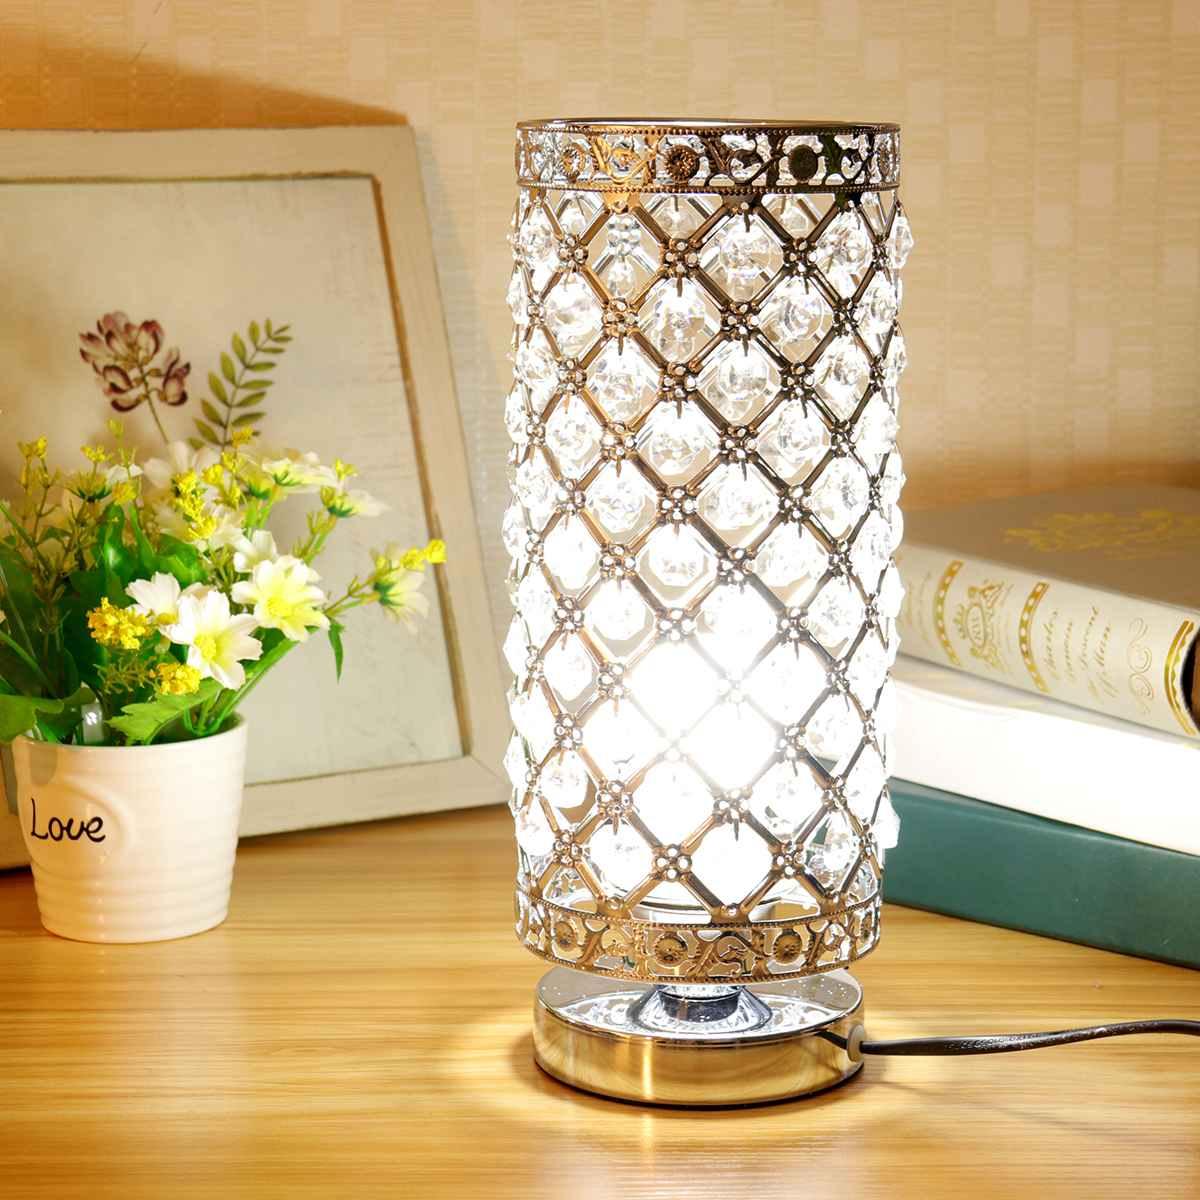 Moderne Kristallen Desk Tafellamp Light Naast Night Lamp E27 Houder Thuis Slaapkamer Decoratie Verstelbare Indoor Verlichting